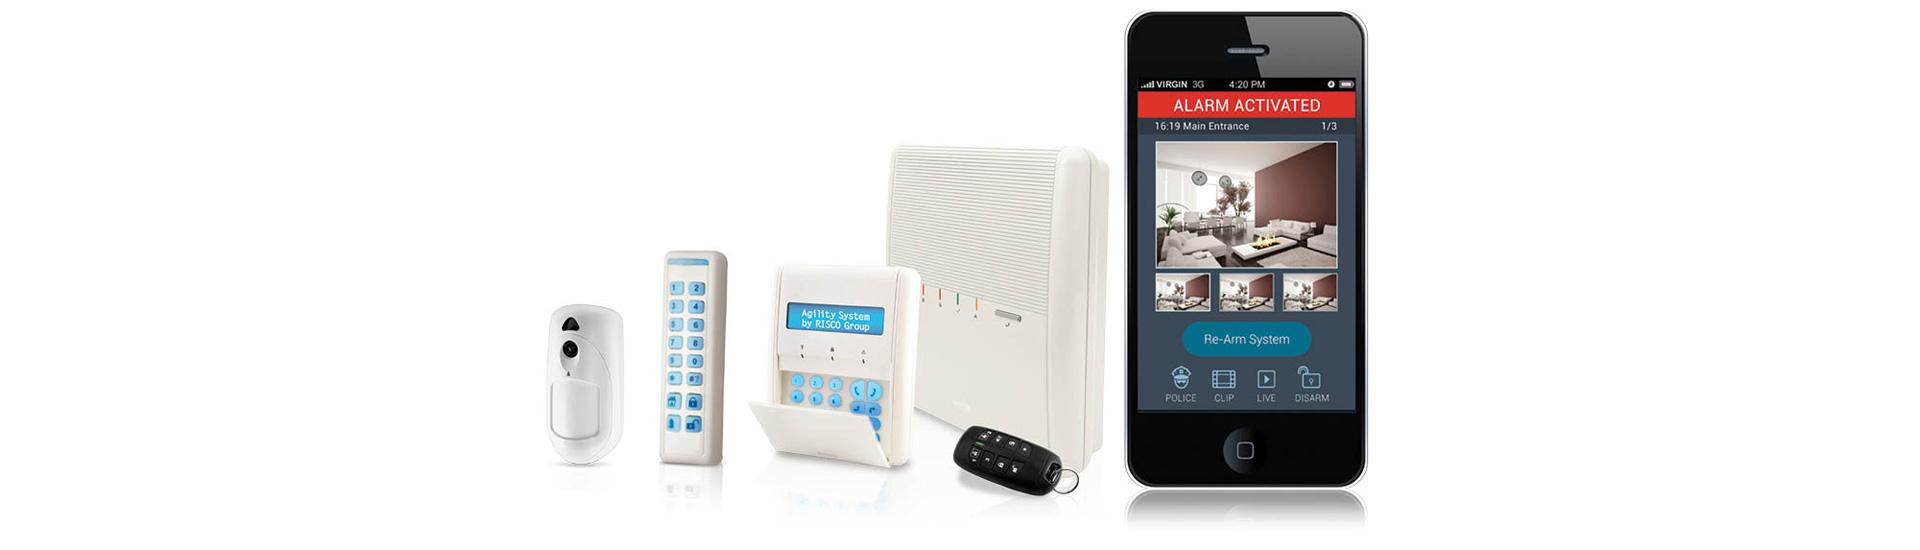 Wireless Alarm System Installers